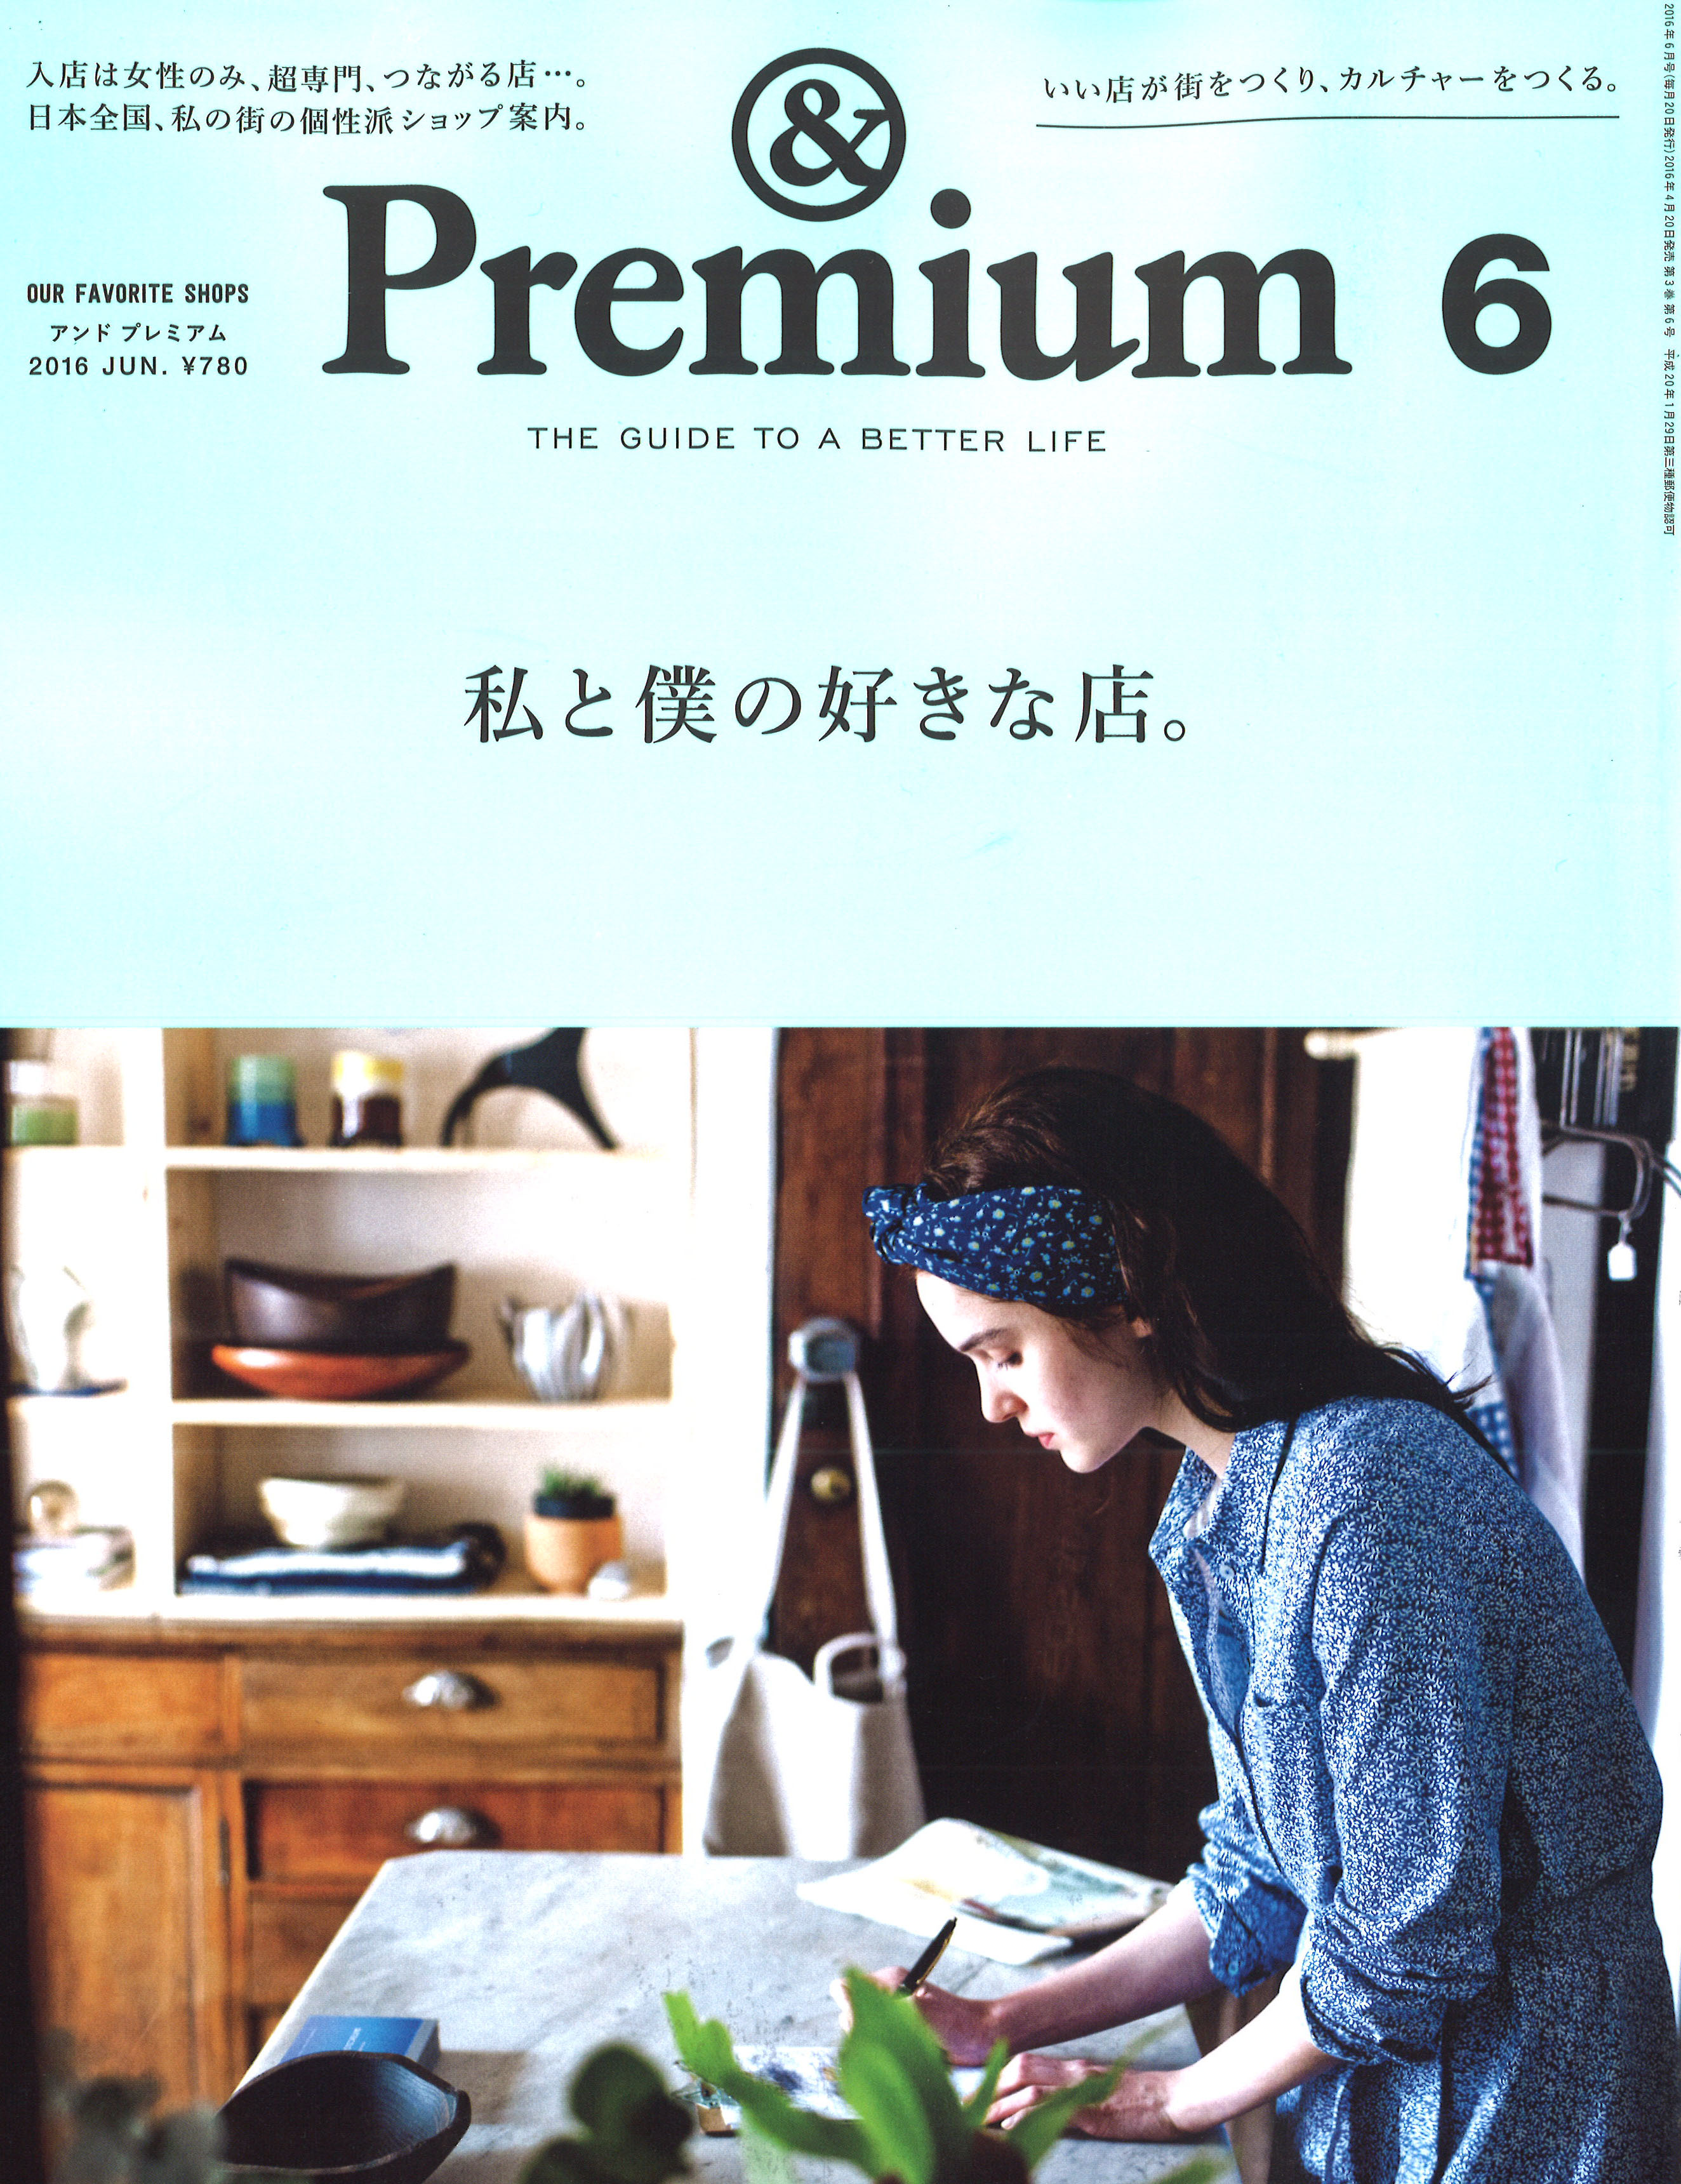 &Premium 6 私と僕の好きな店。の写真